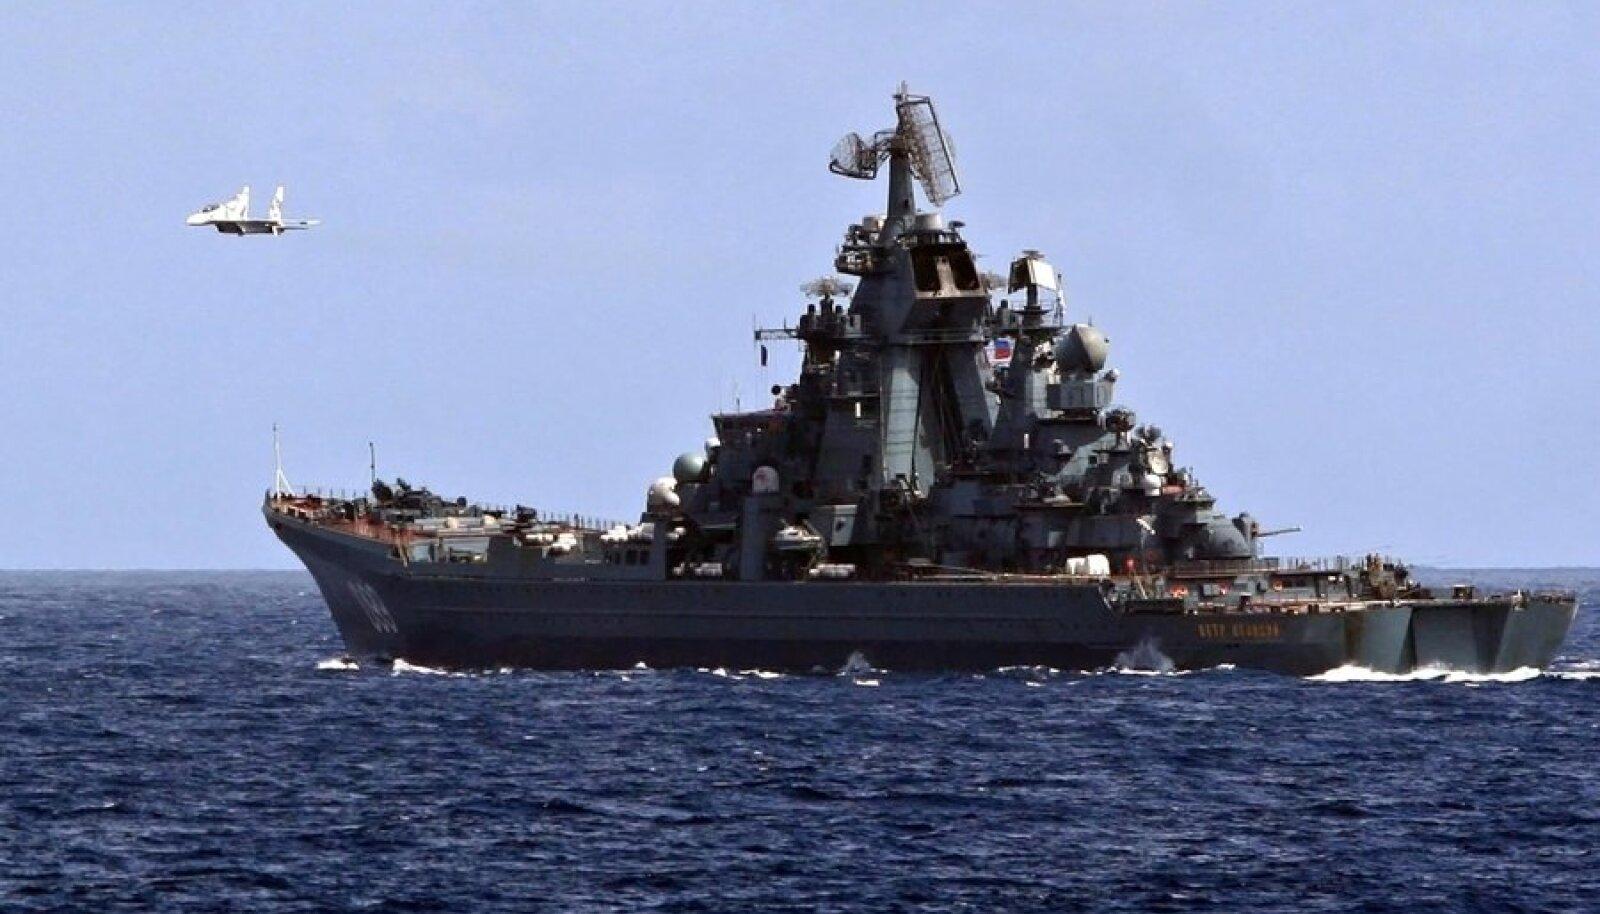 Vene raketiristleja Pjotr Velikii